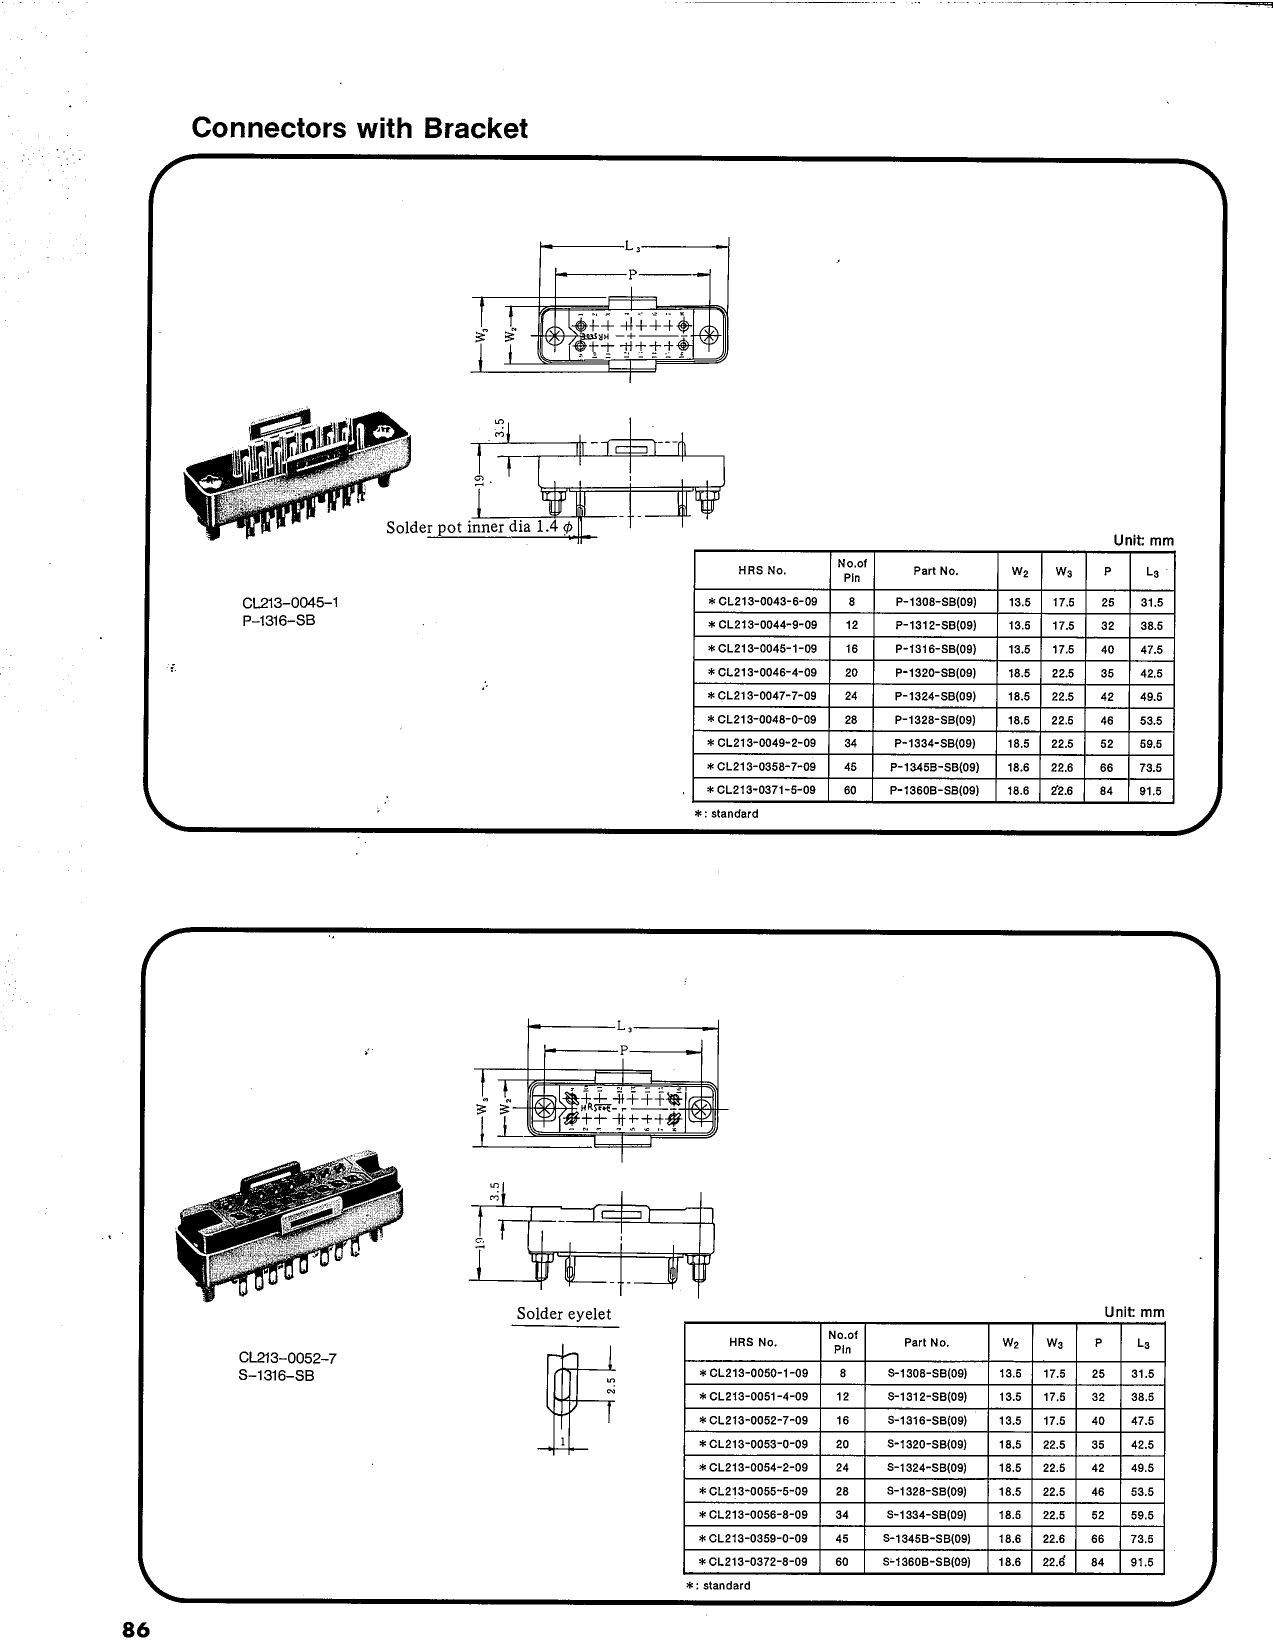 S-138-SB pdf